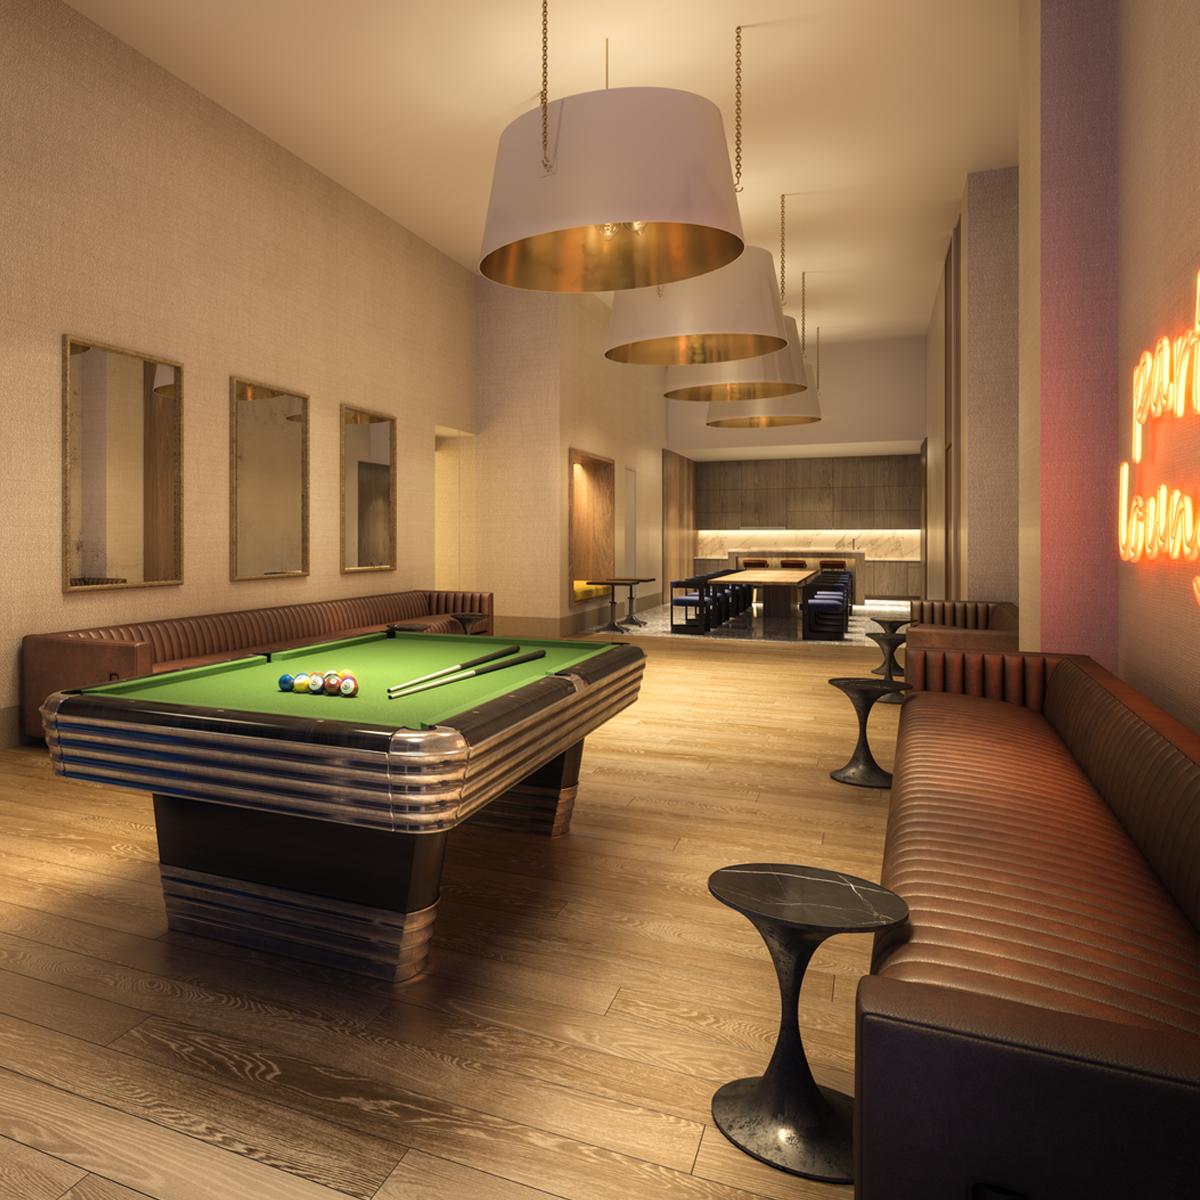 19 Dutch - game room-billiards - luxury apt amenity